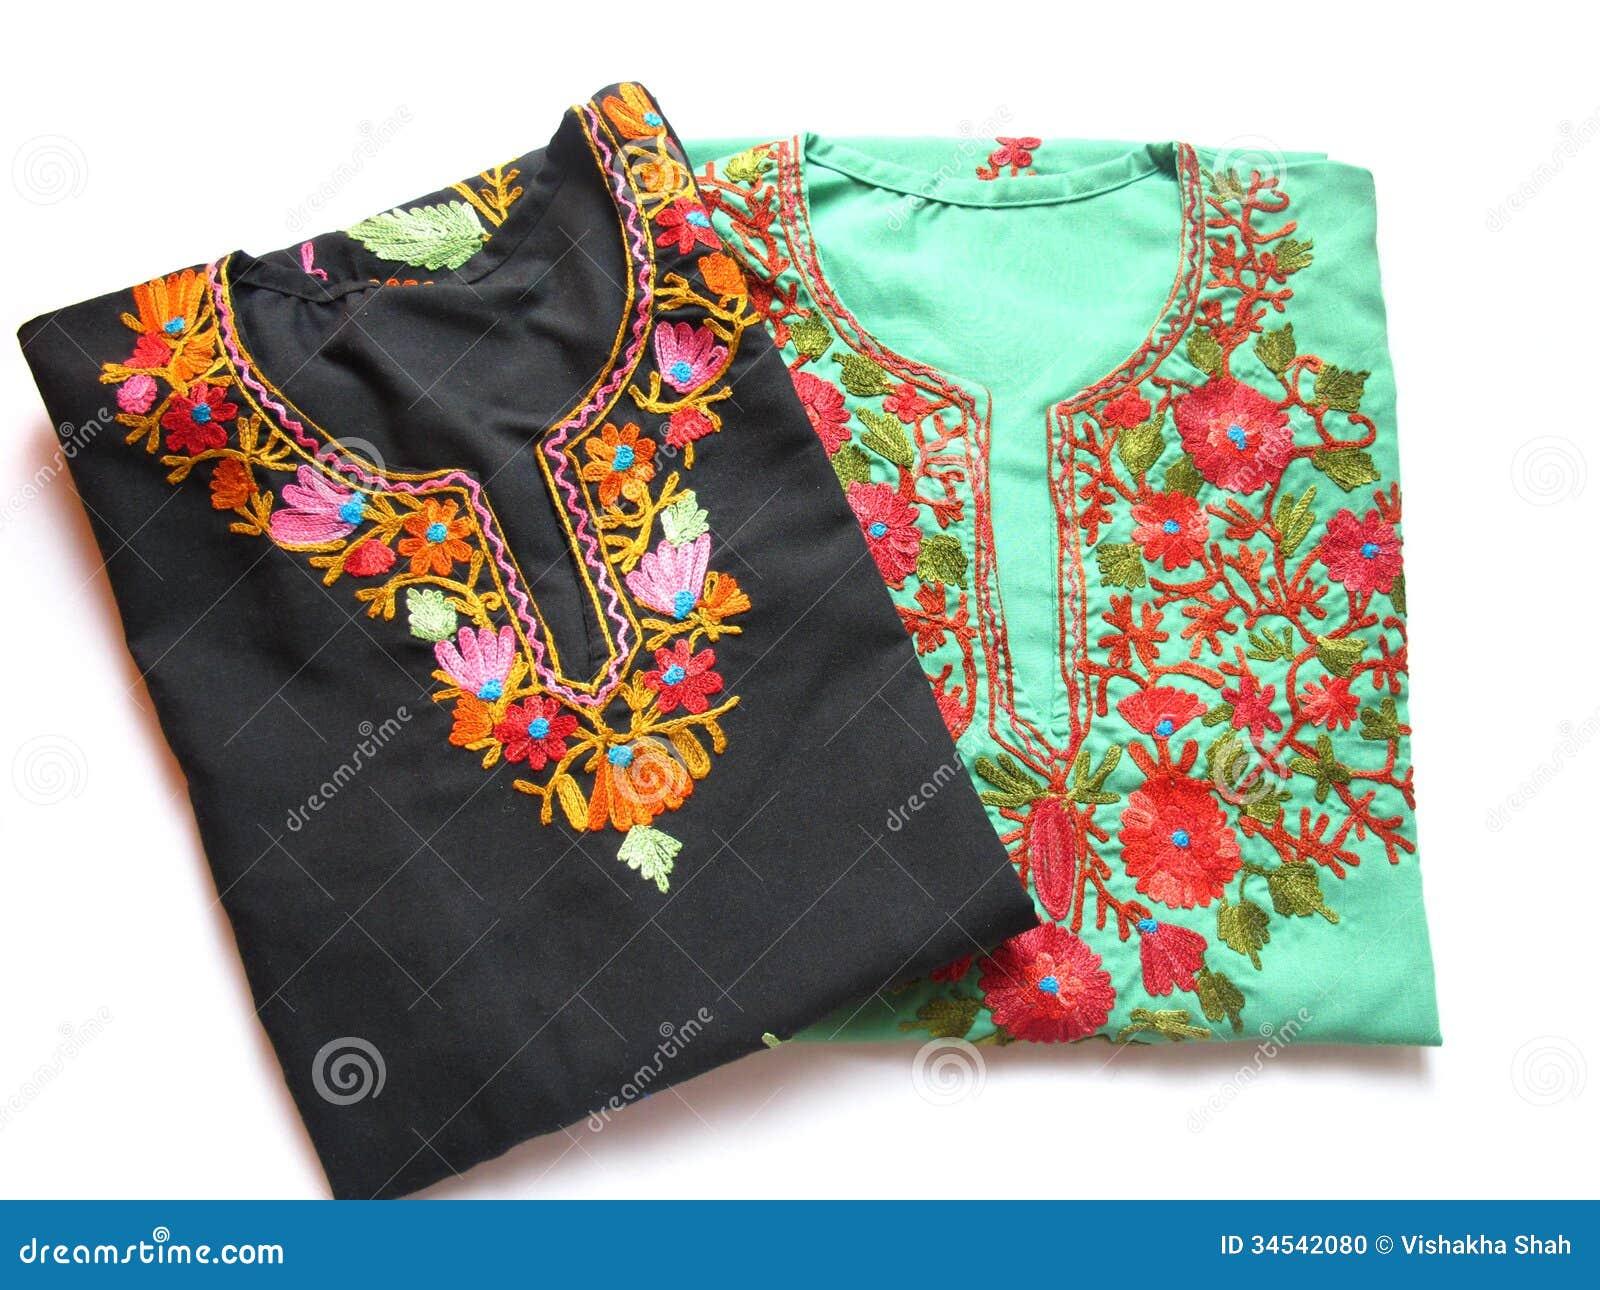 Kashmiri Embroidery Kurtis Stock Photo  Image 34542080